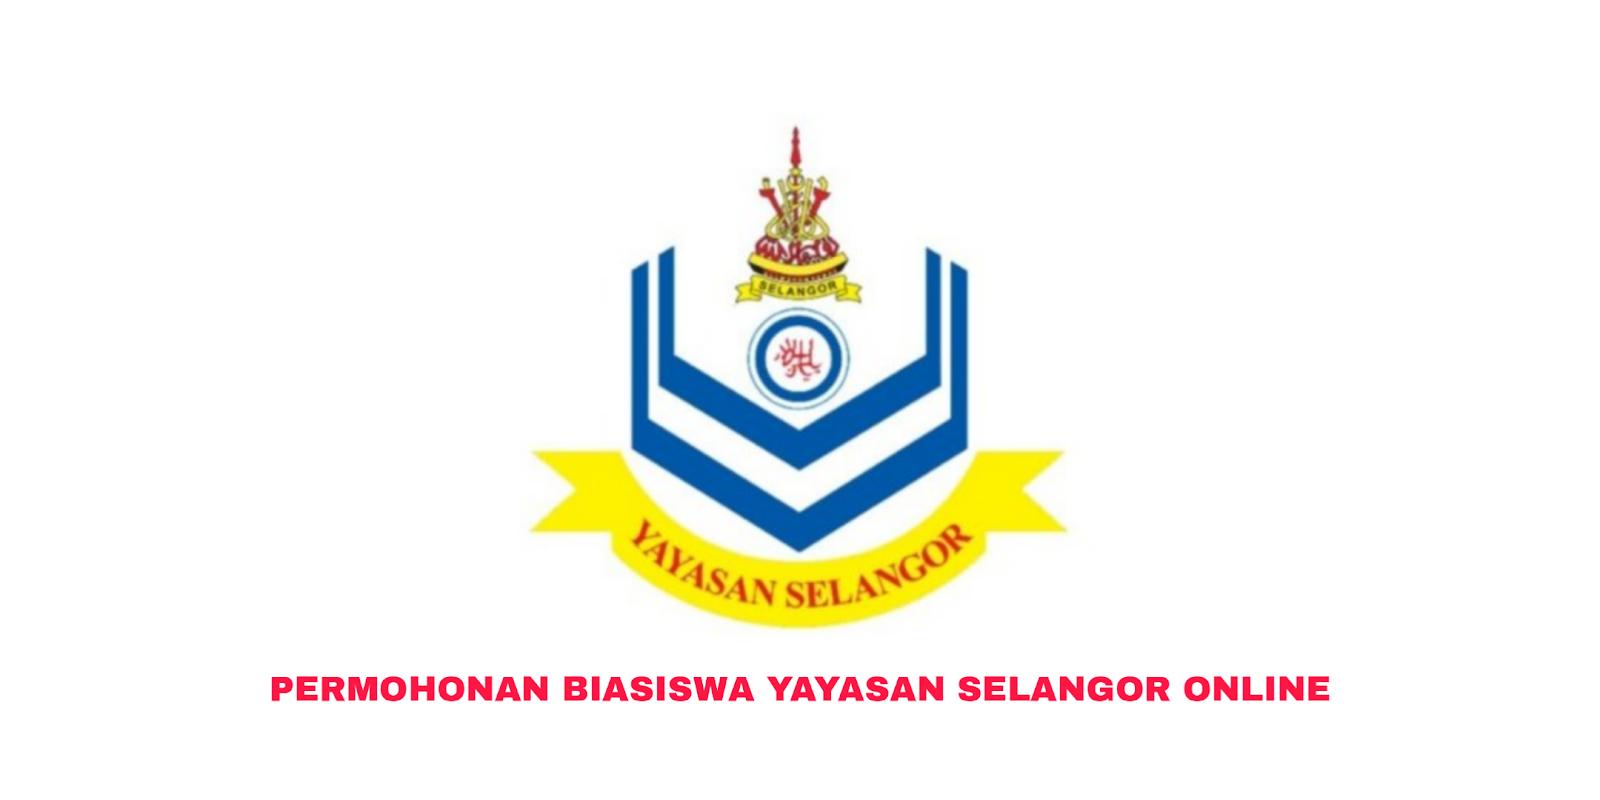 Permohonan Biasiswa Yayasan Selangor 2021 Online (Borang ...